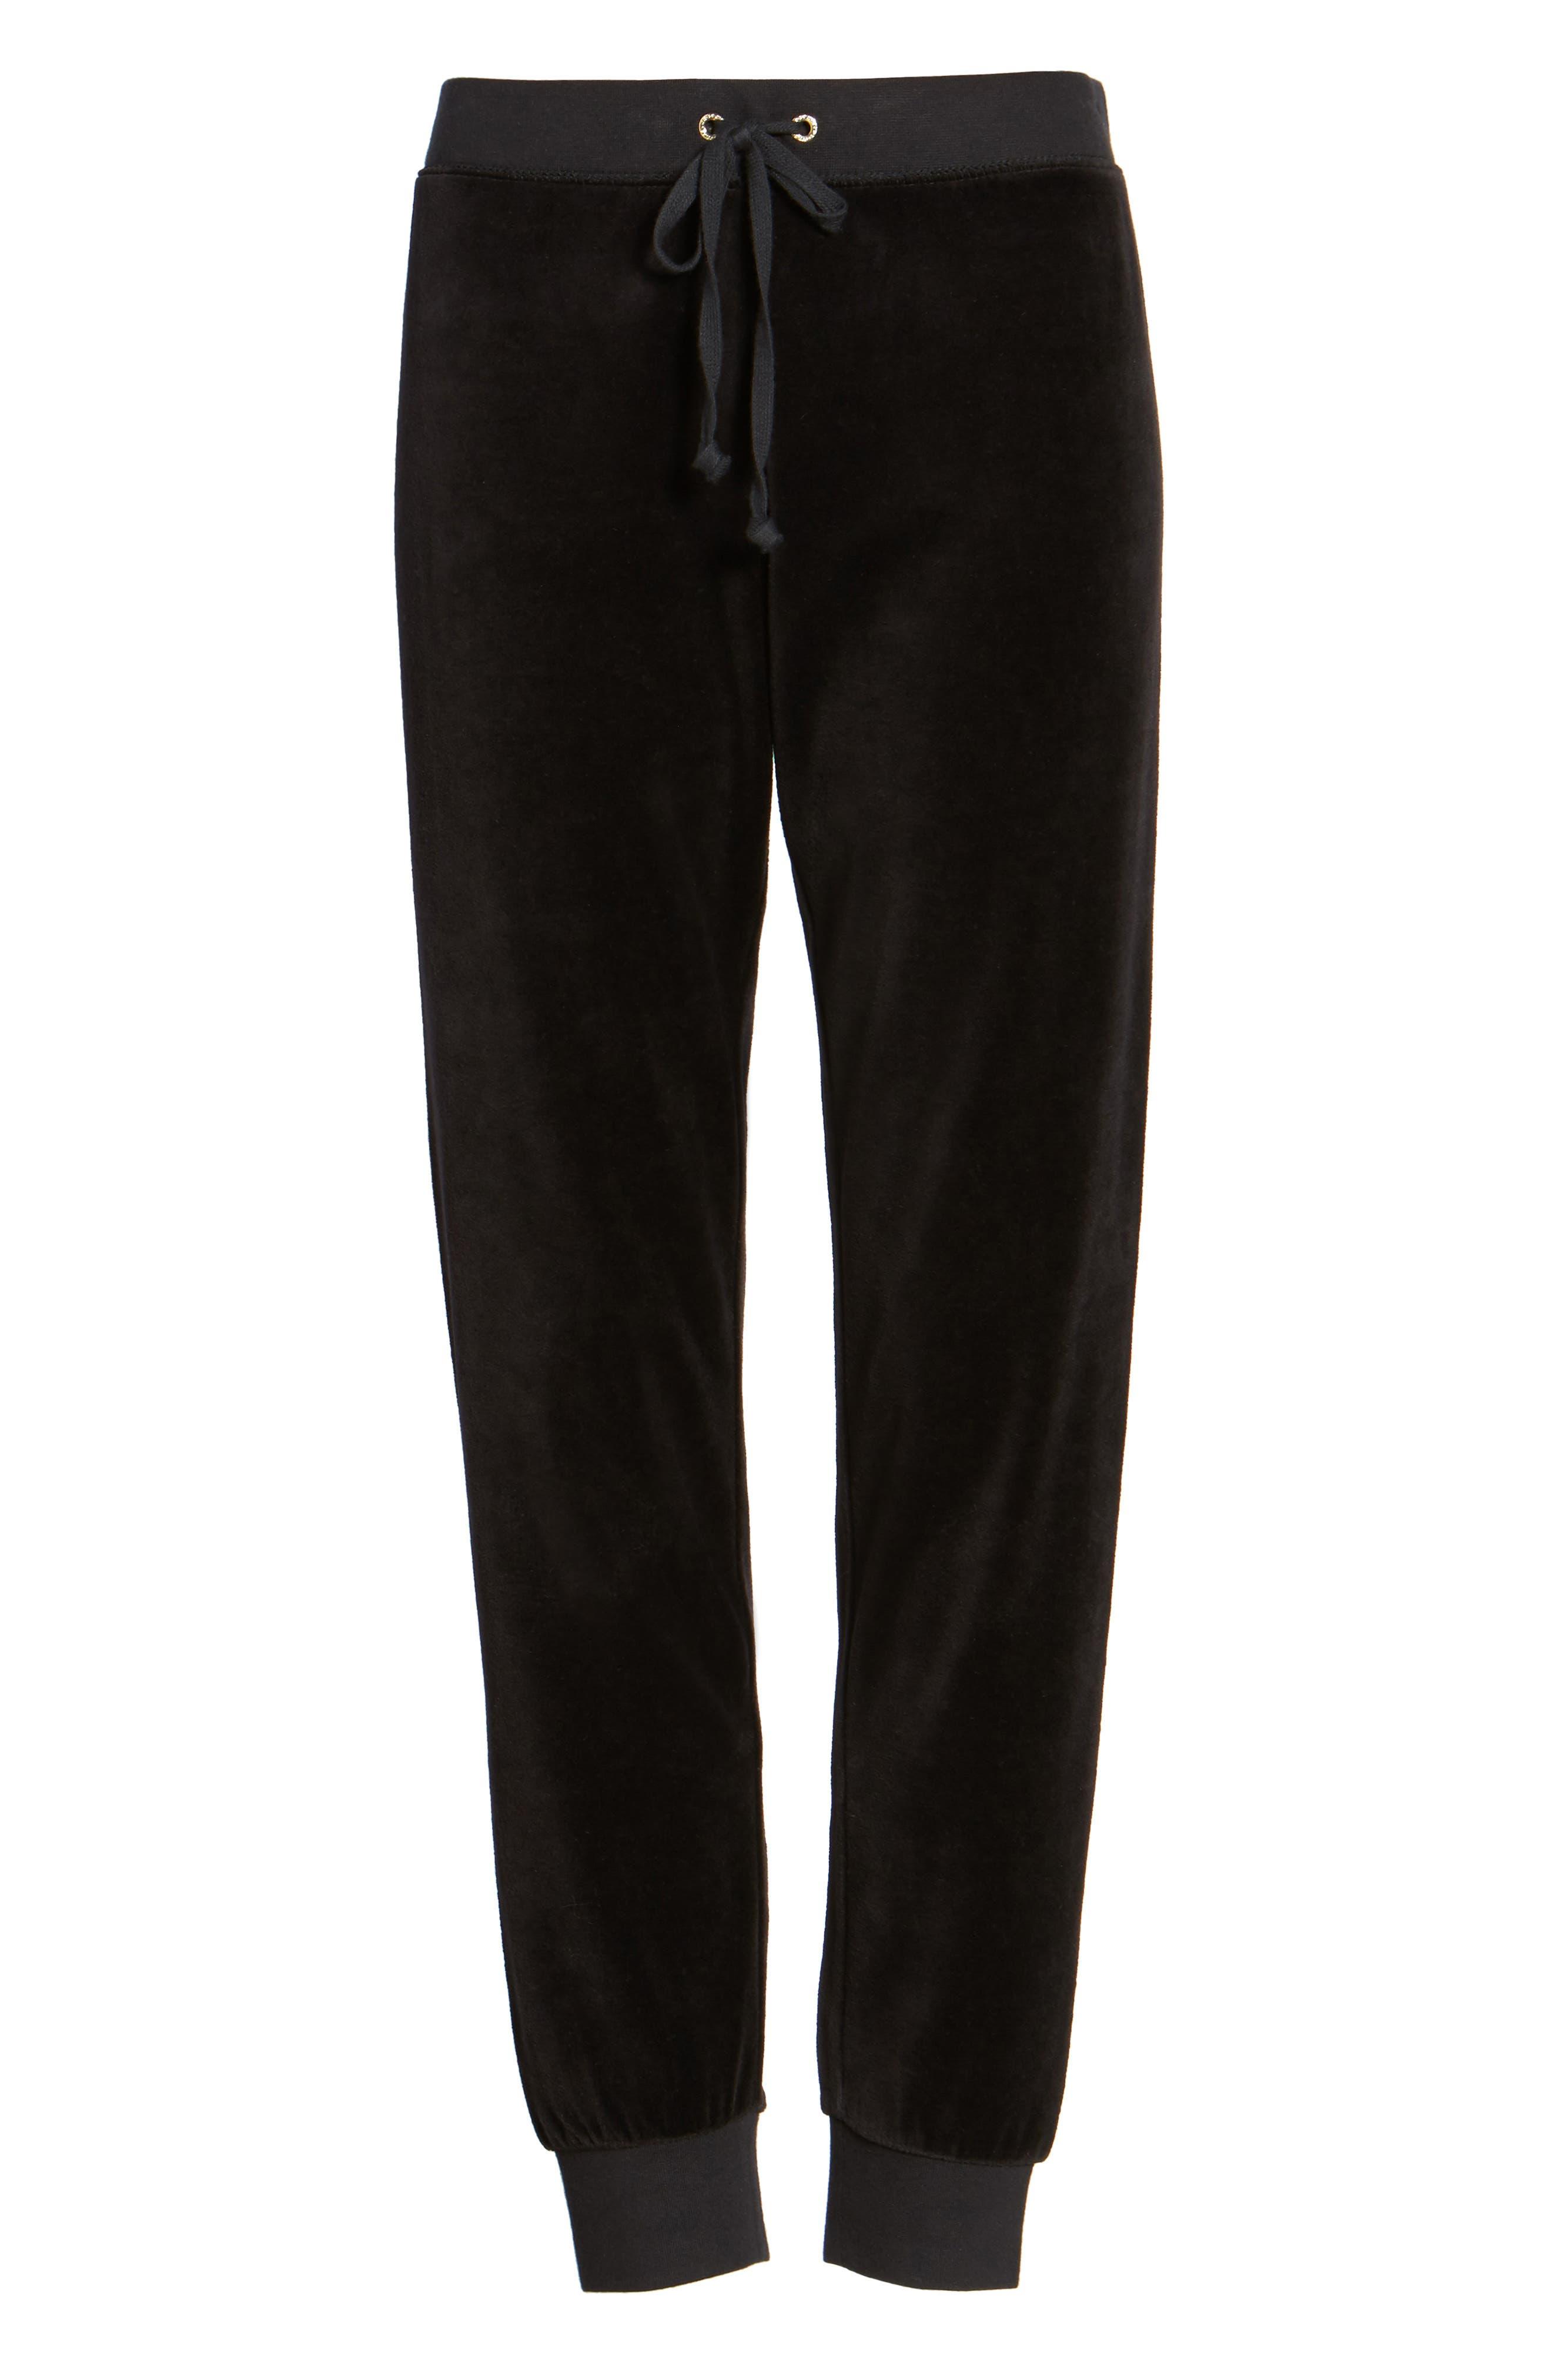 Zuma Velour Track Pants,                         Main,                         color, Pitch Black